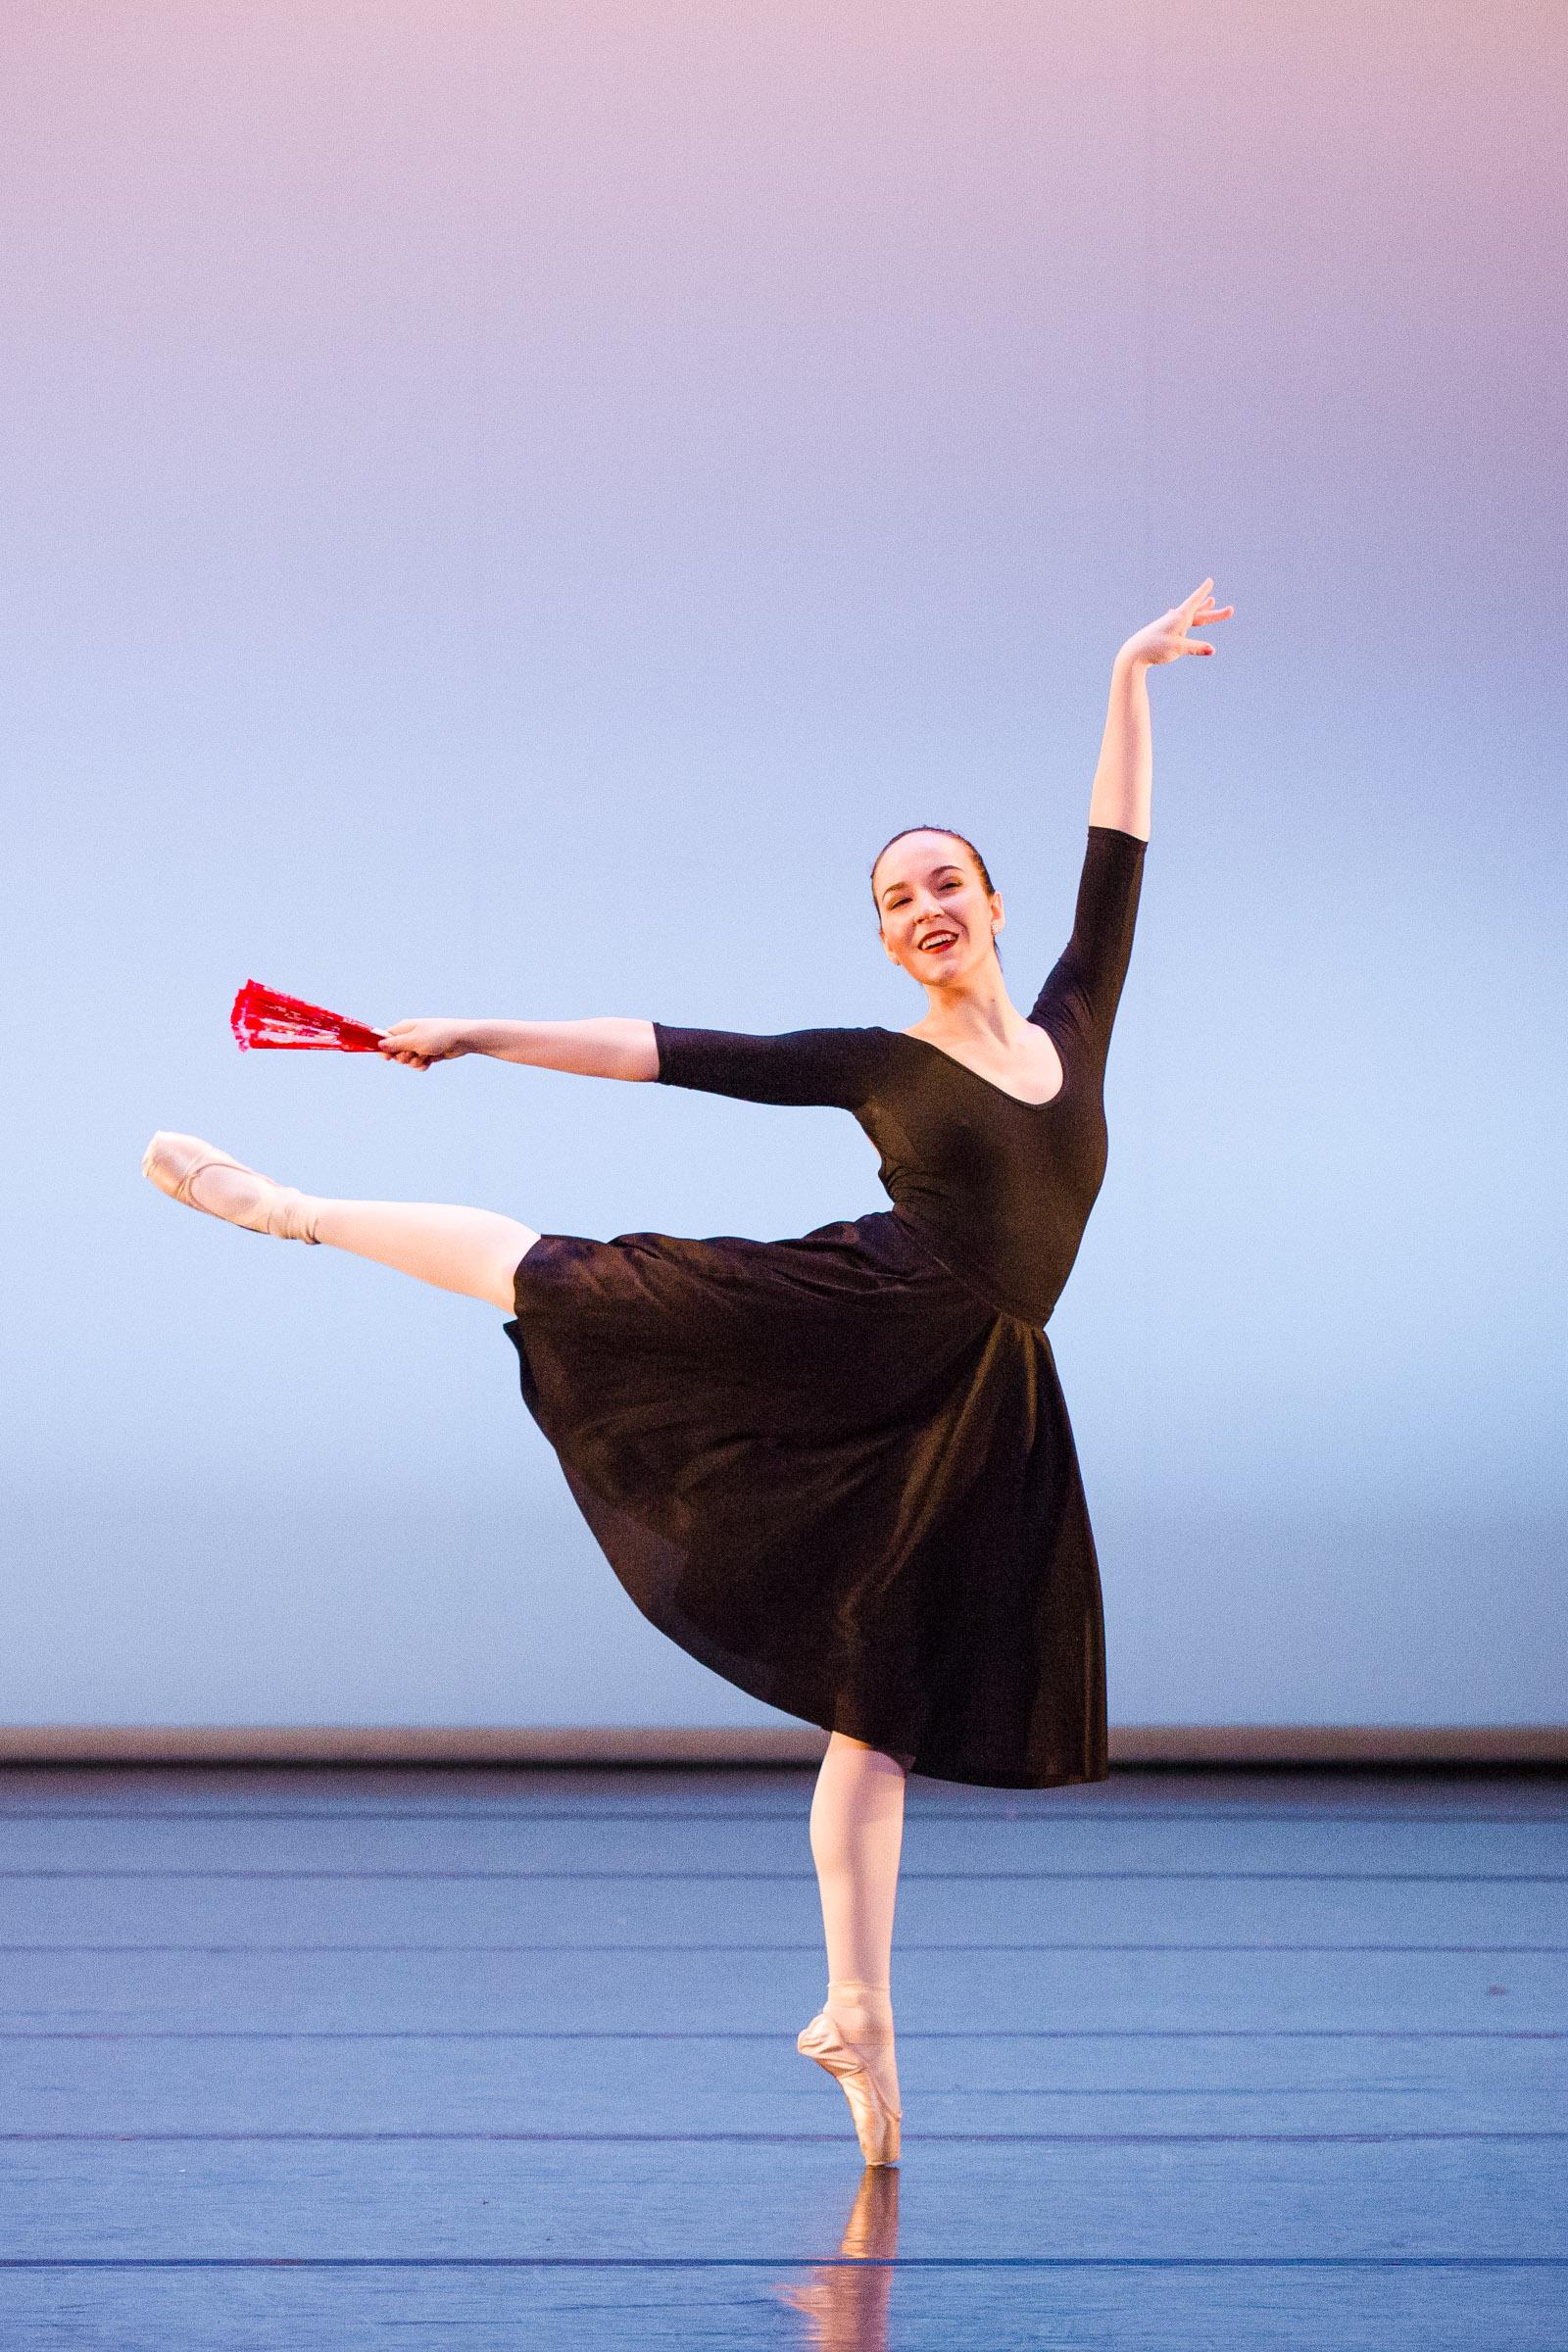 Ballet dancer en pointe